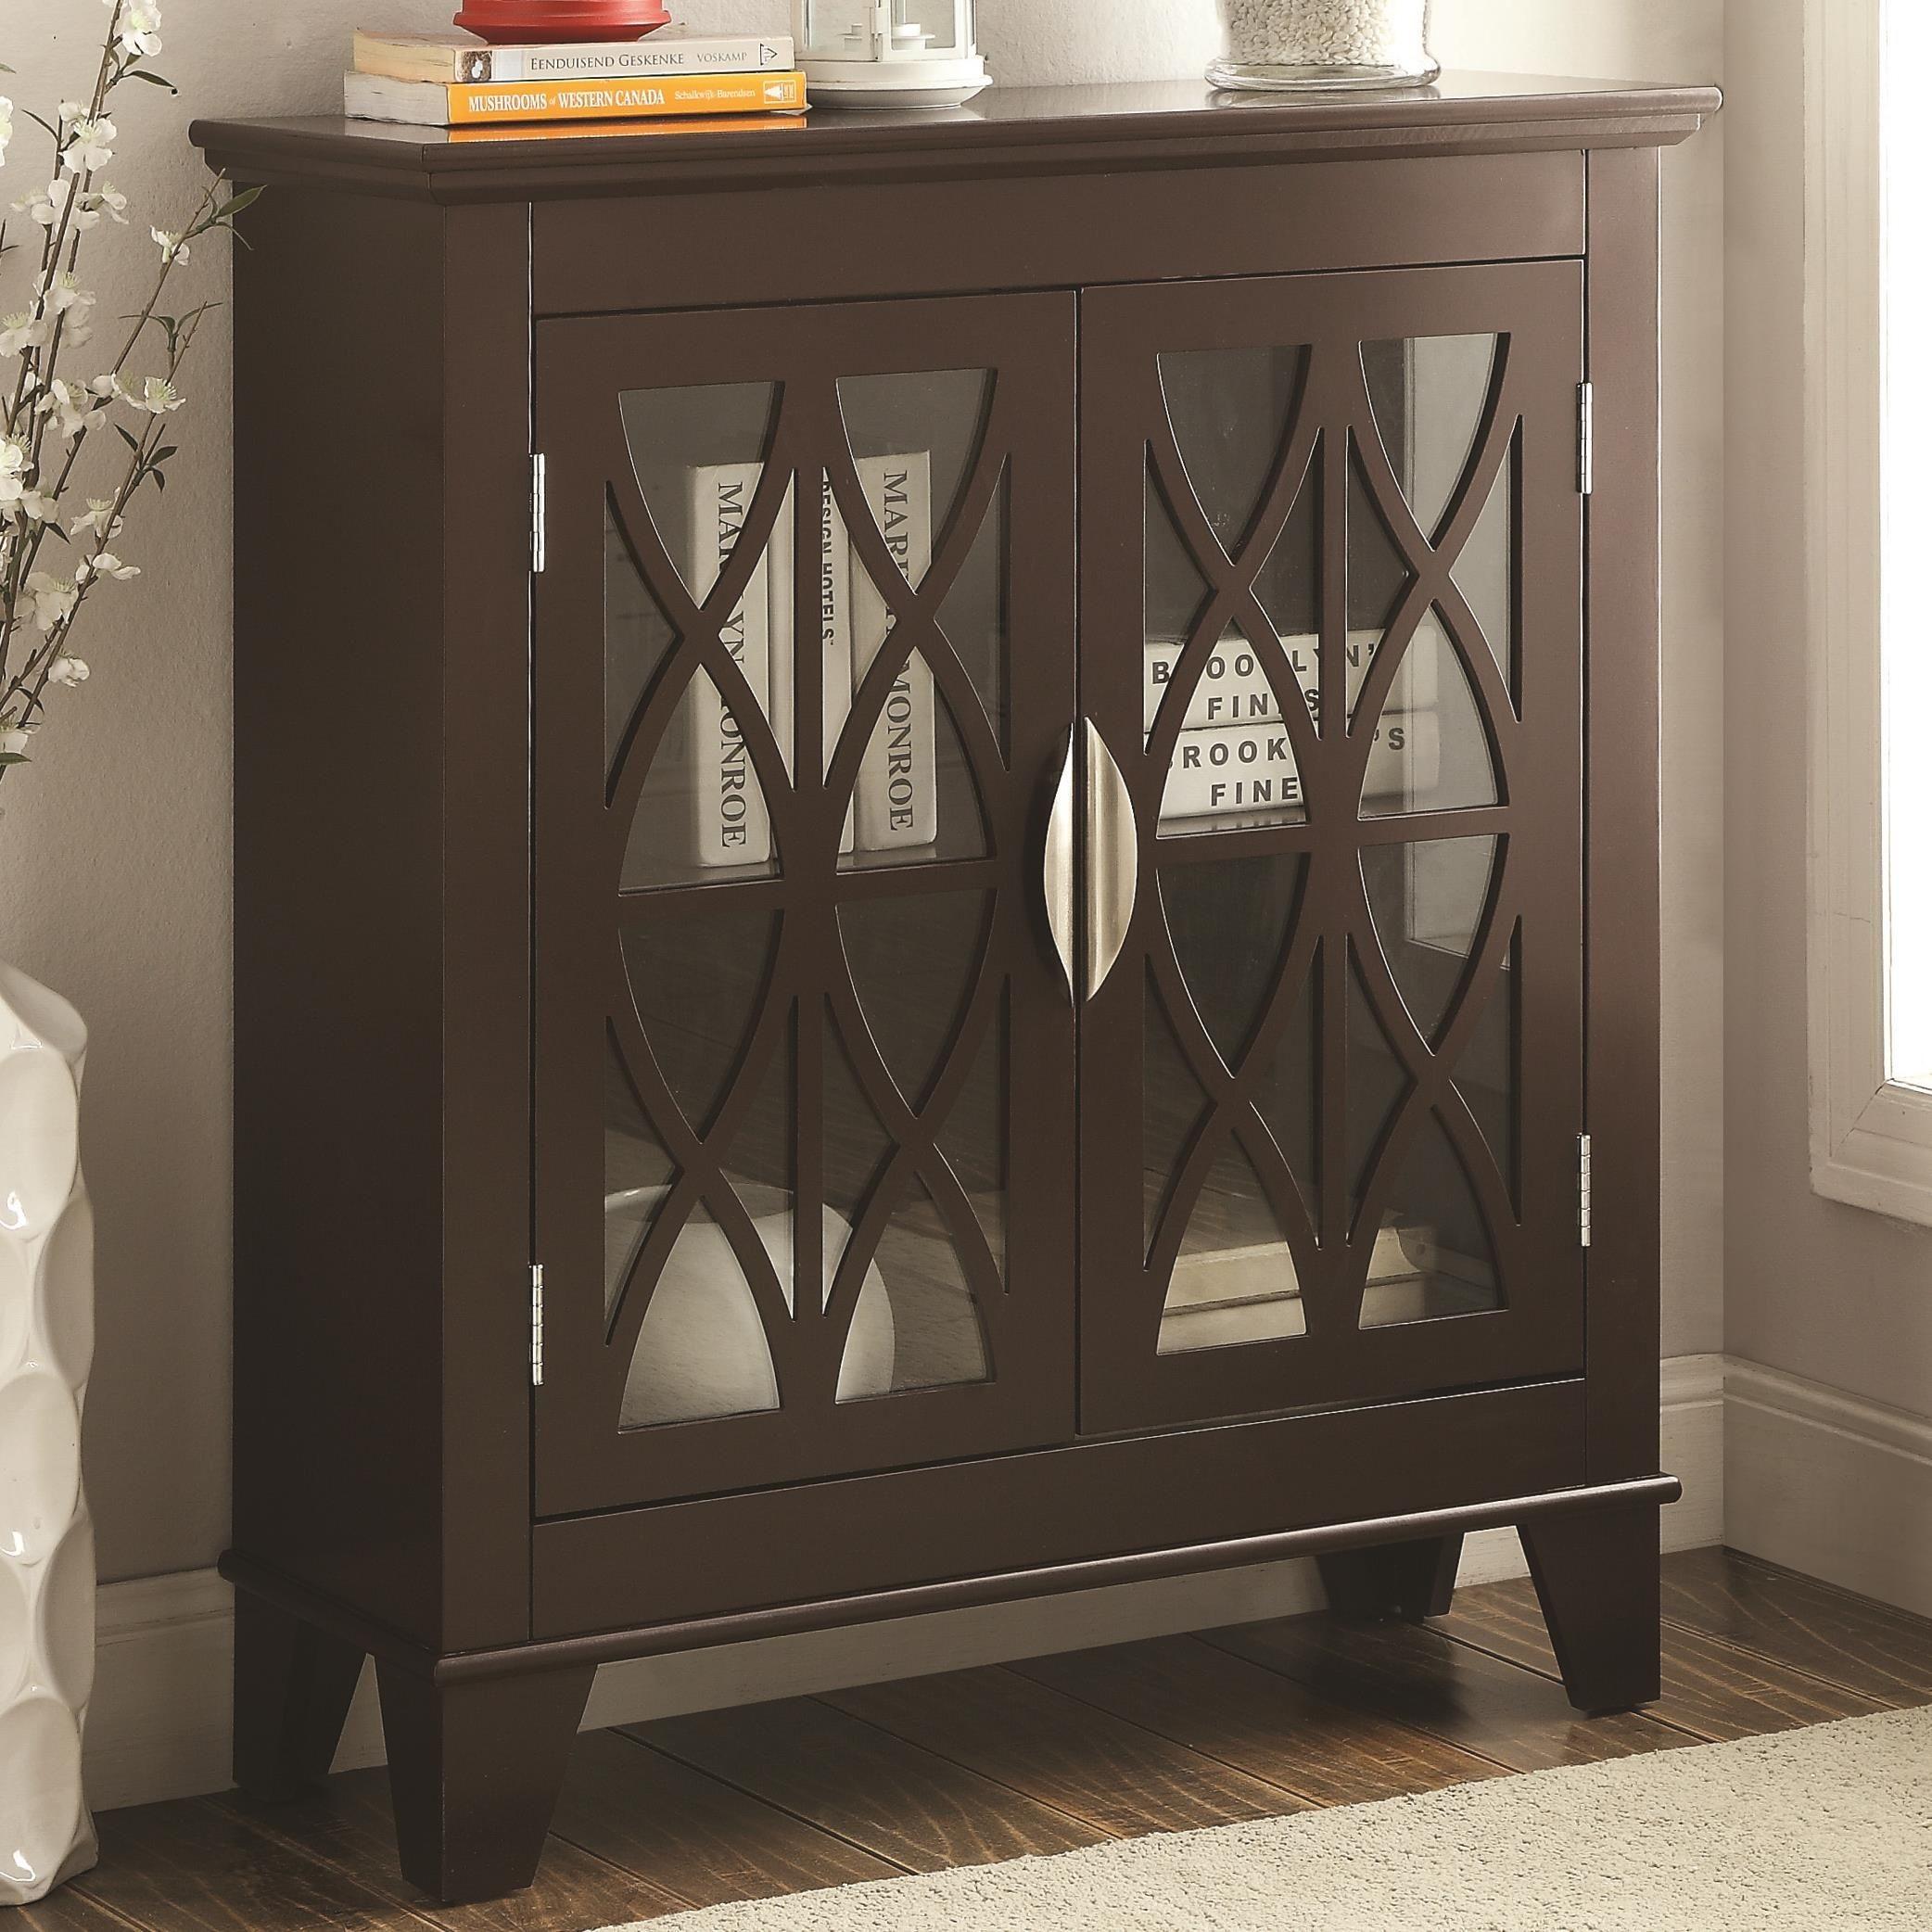 950311 Glass Doors Cappuccino Accent Cabinet  Coaster Furniture. 950311 Glass Doors Cappuccino Accent Cabinet from Coaster  950311